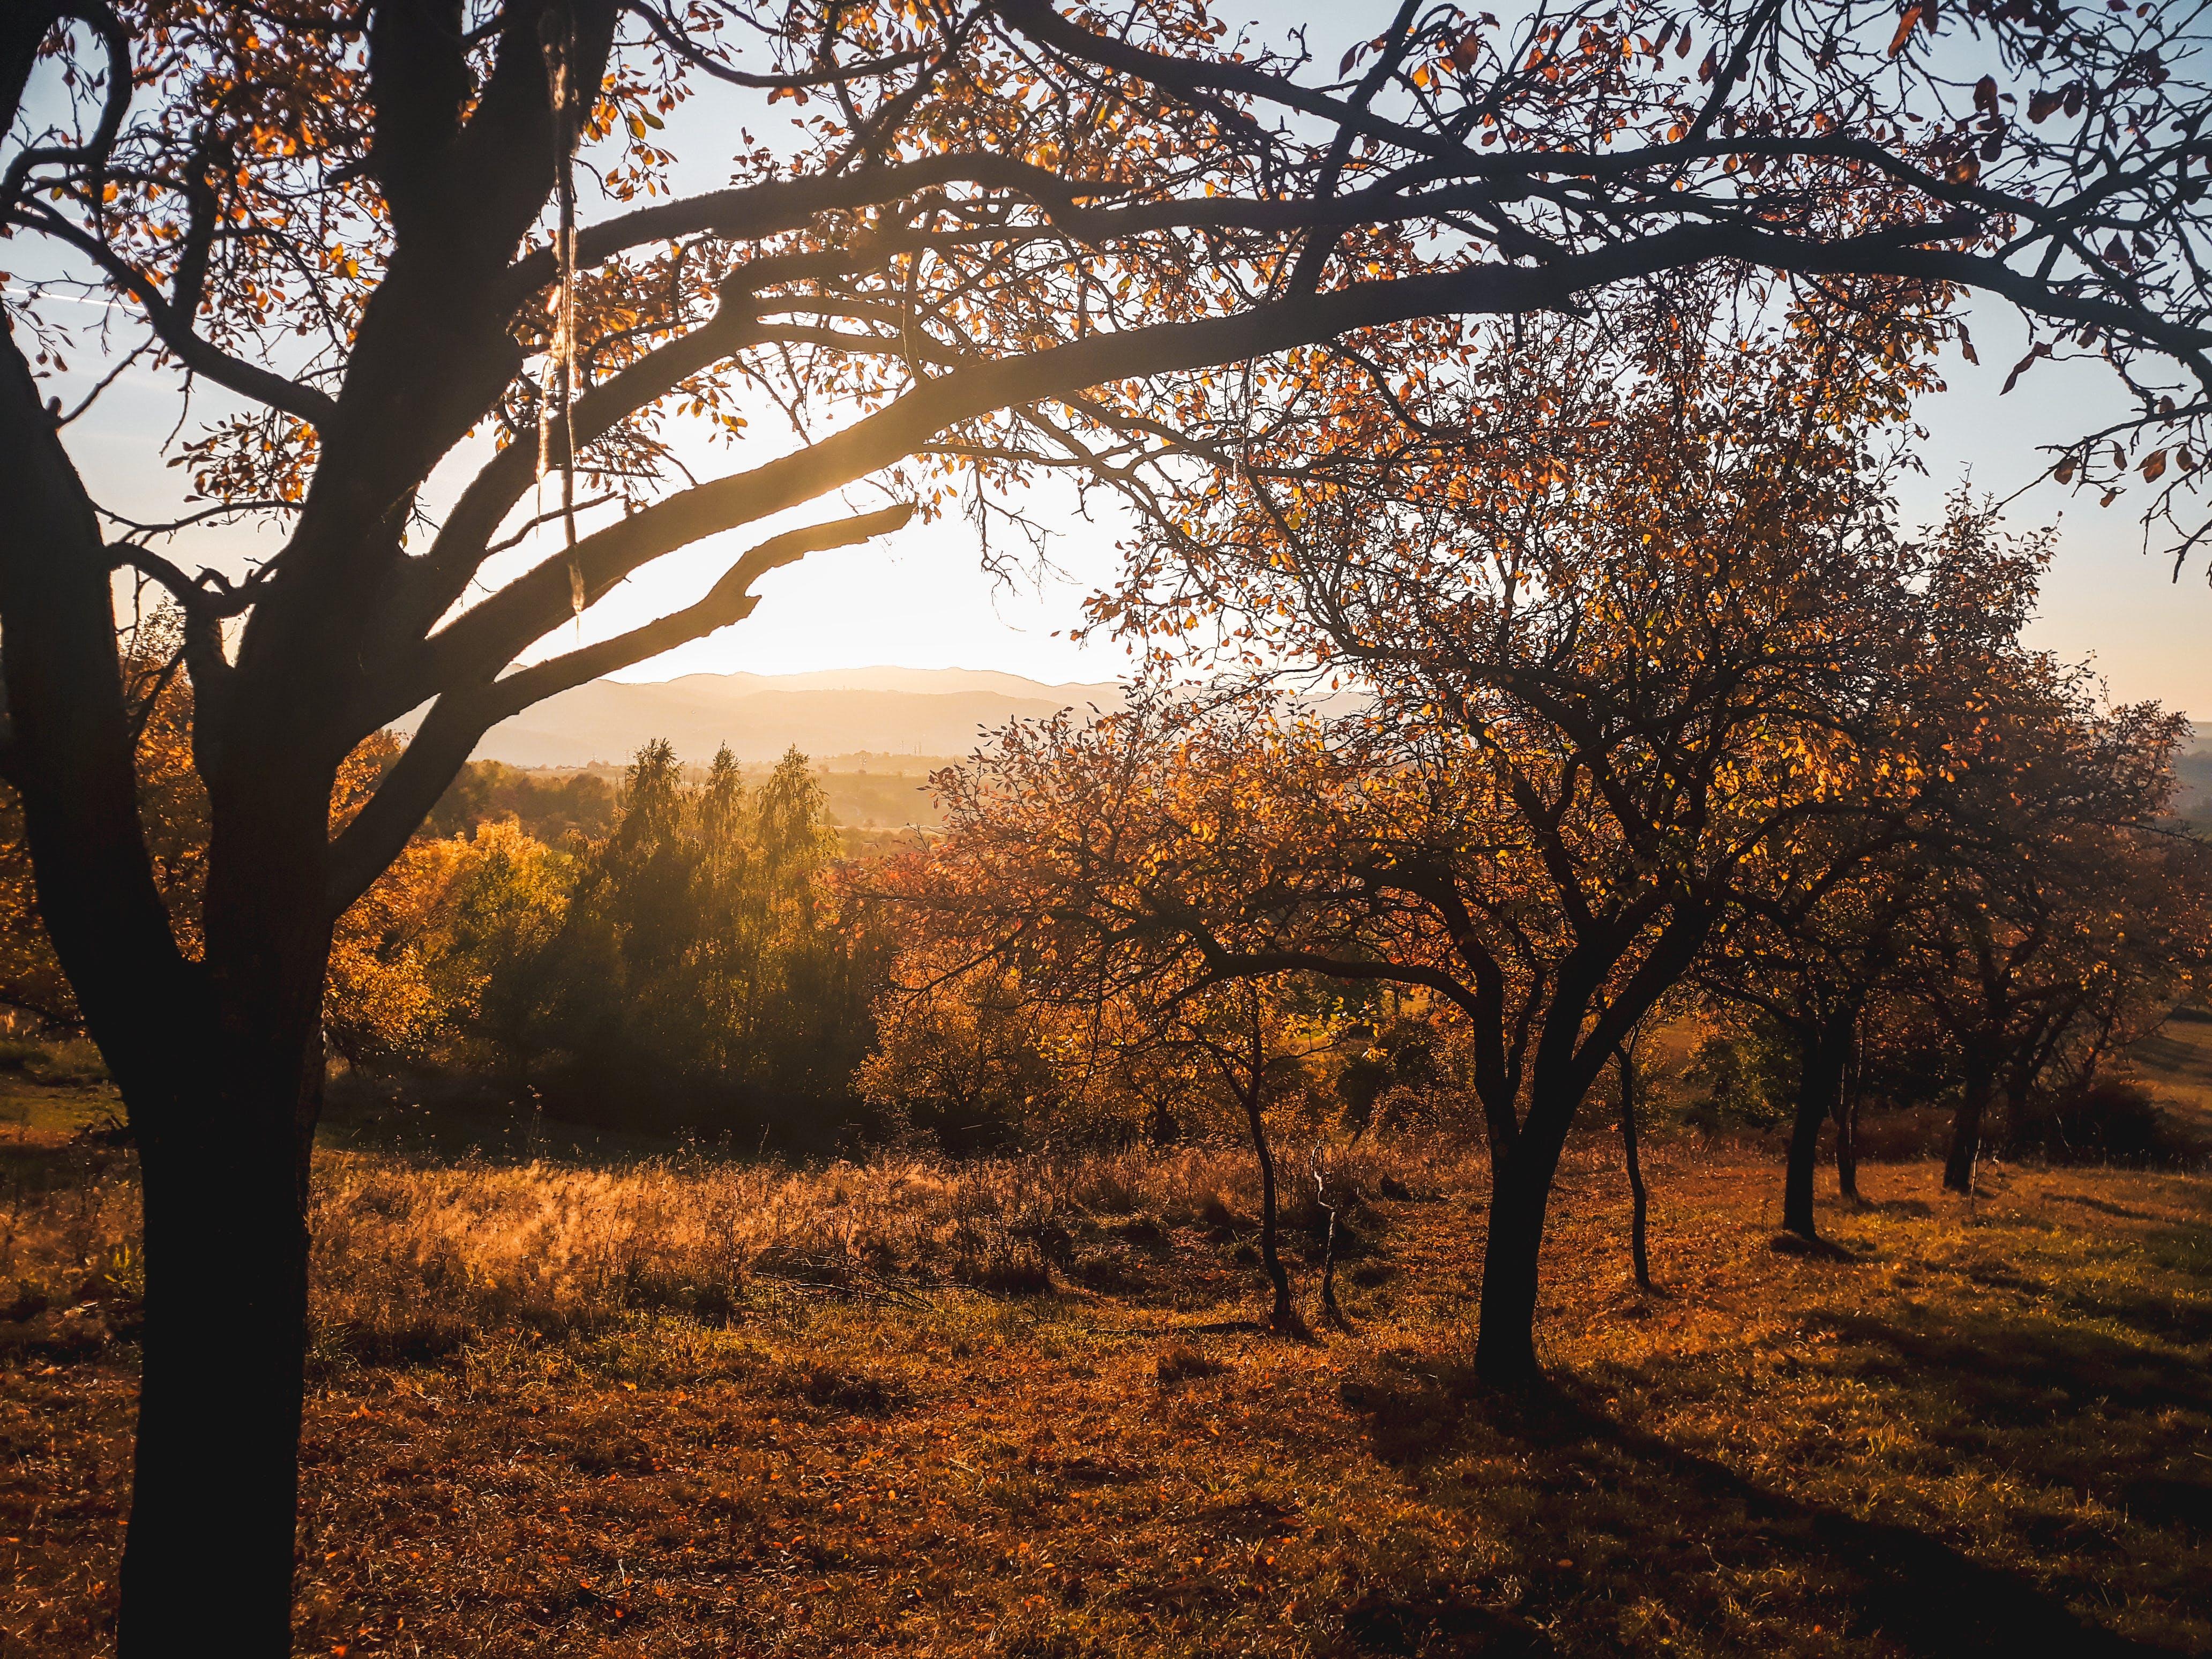 Kostenloses Stock Foto zu äste, bäume, dämmerung, gold